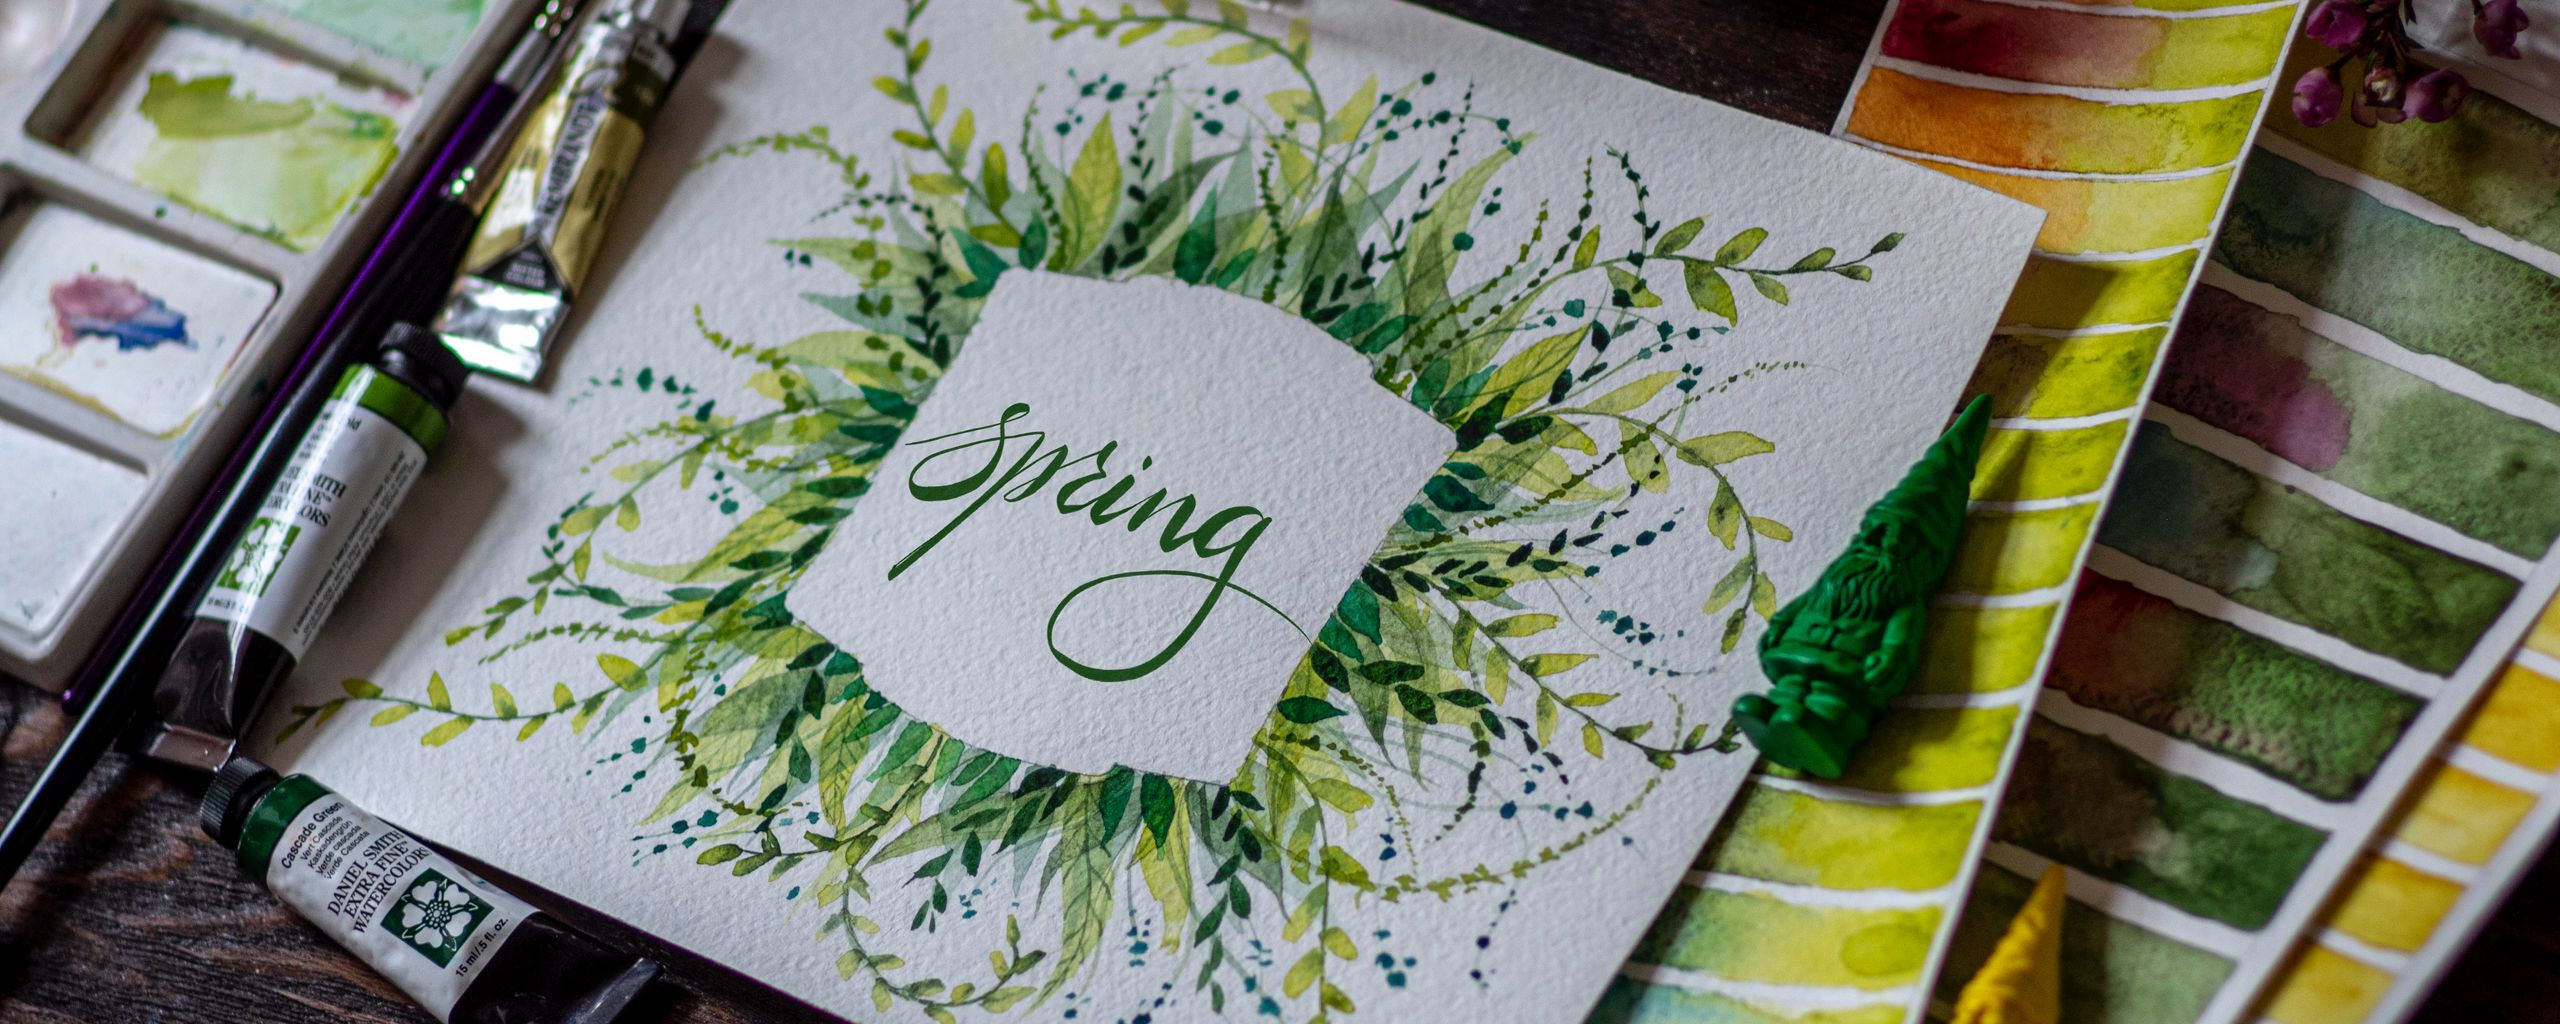 2560x1024 Обои весна, слово, леттеринг, краски, акварель